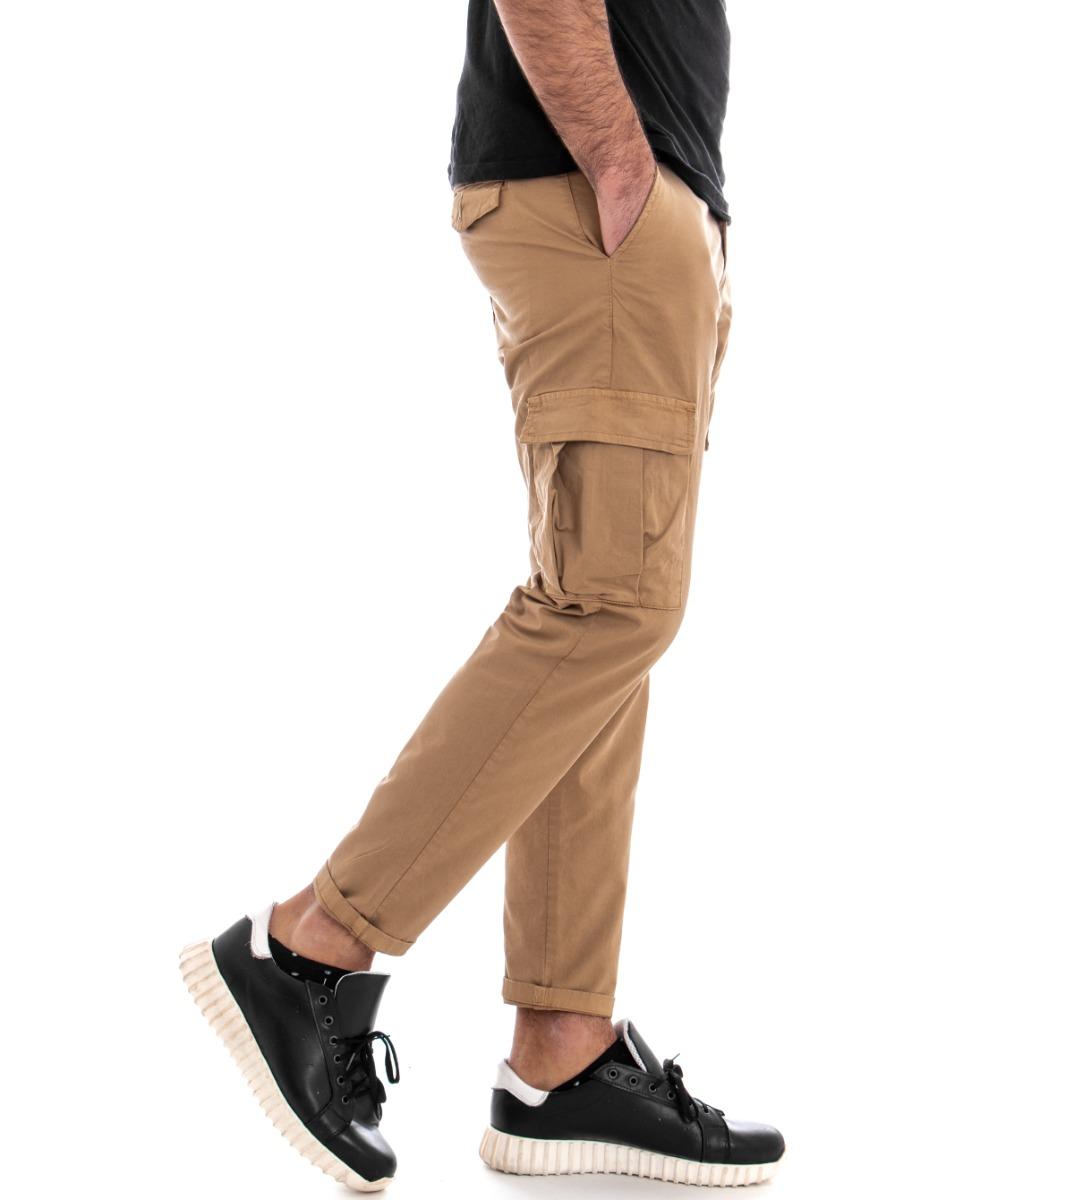 Pantalone-Uomo-Cargo-Tasca-America-Kaki-Tinta-Unita-Cotone-Casual-GIOSAL miniatura 6